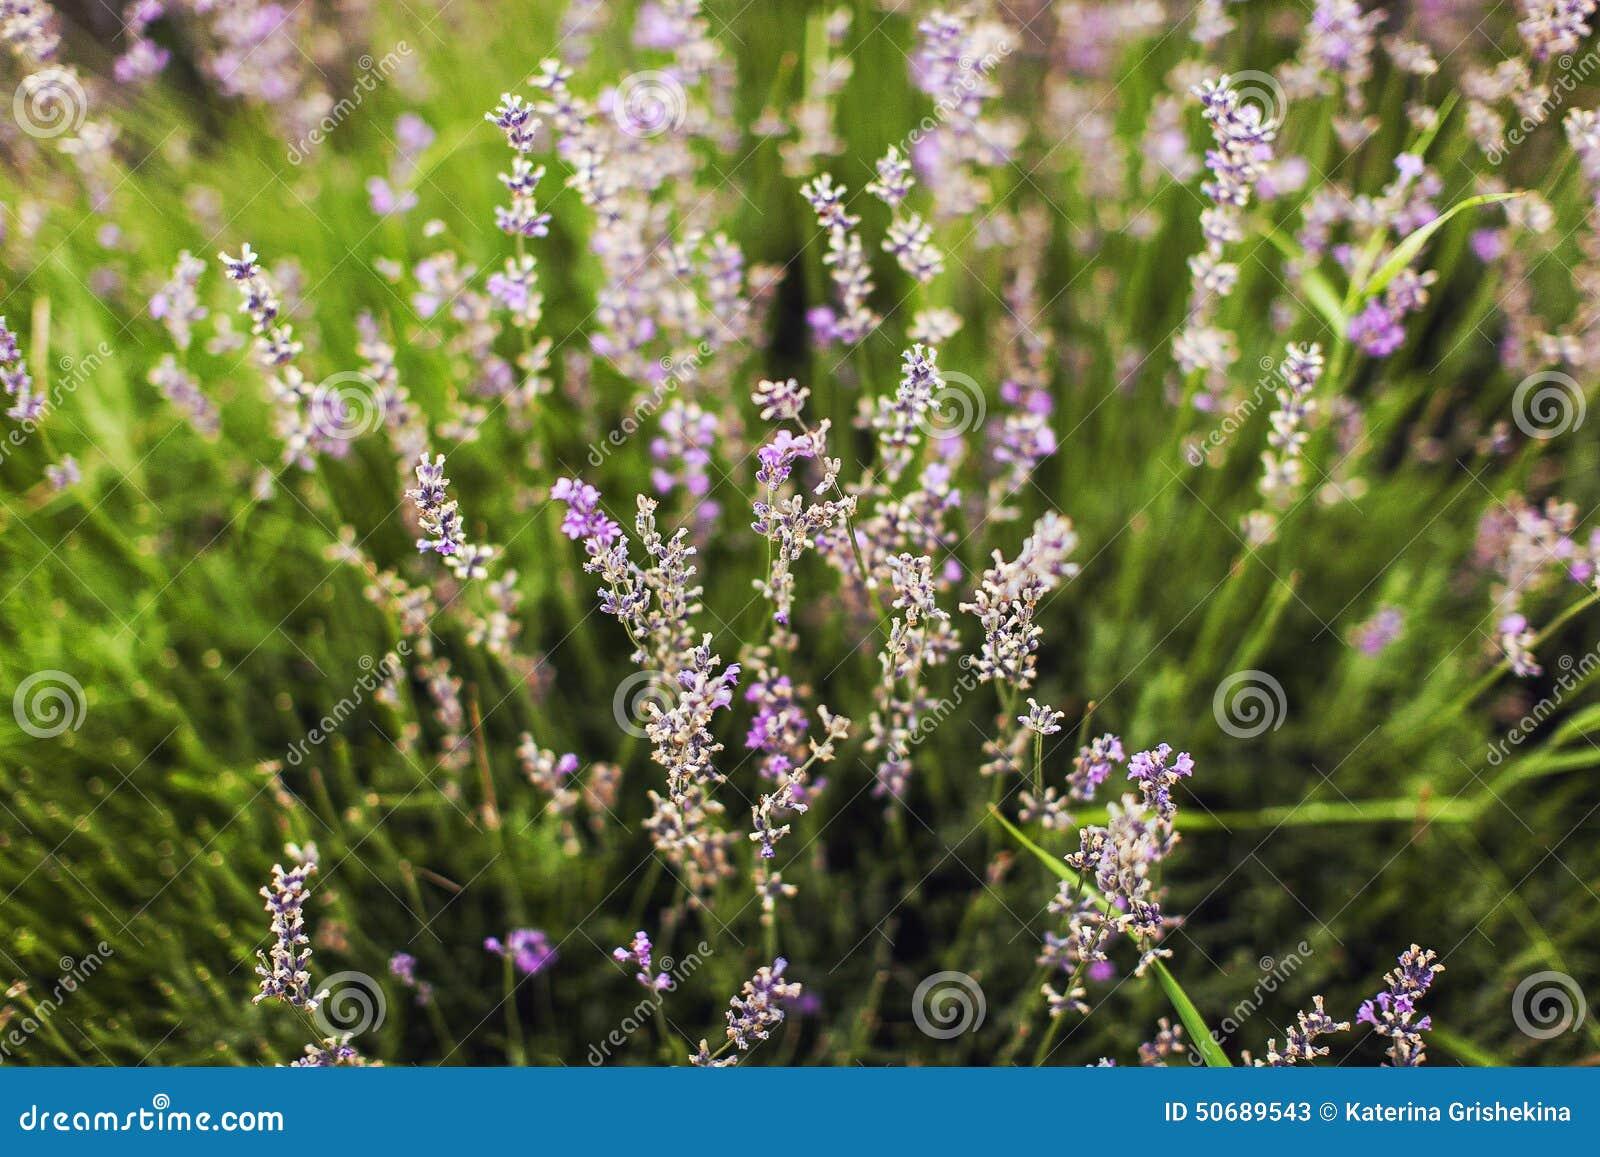 Download 淡紫色 库存图片. 图片 包括有 脆弱, 粉红色, beautifuler, 颜色, 特写镜头, 关闭, 纤巧 - 50689543